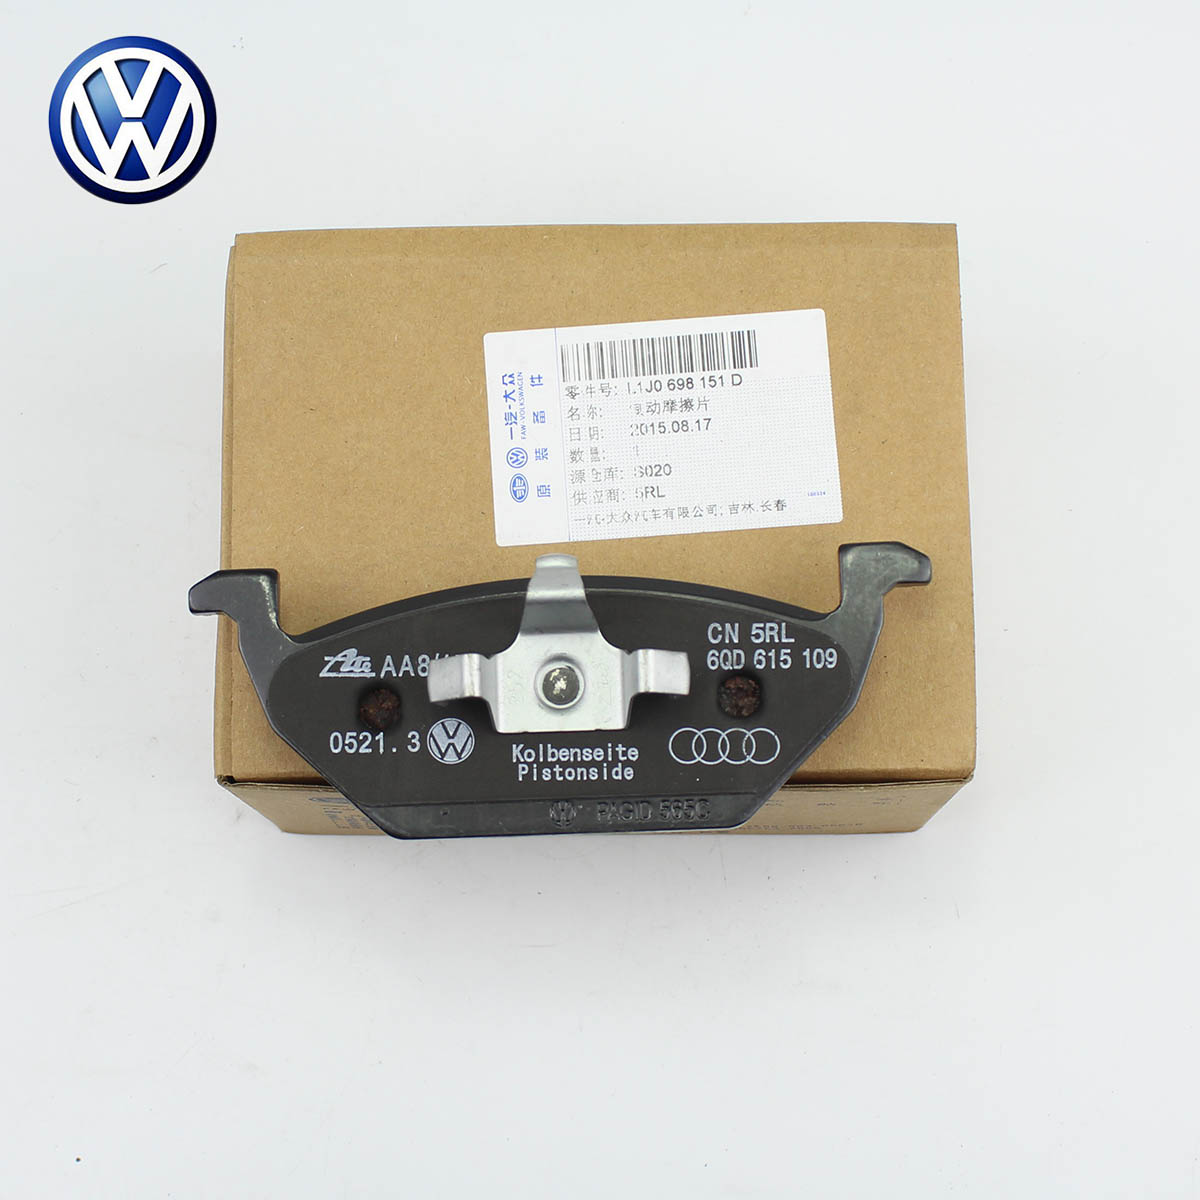 Front Brake Pads Friction Plate 1J0 698 151 D For VW Jetta Golf Mk4 Bora бра mantra bora bora c0103